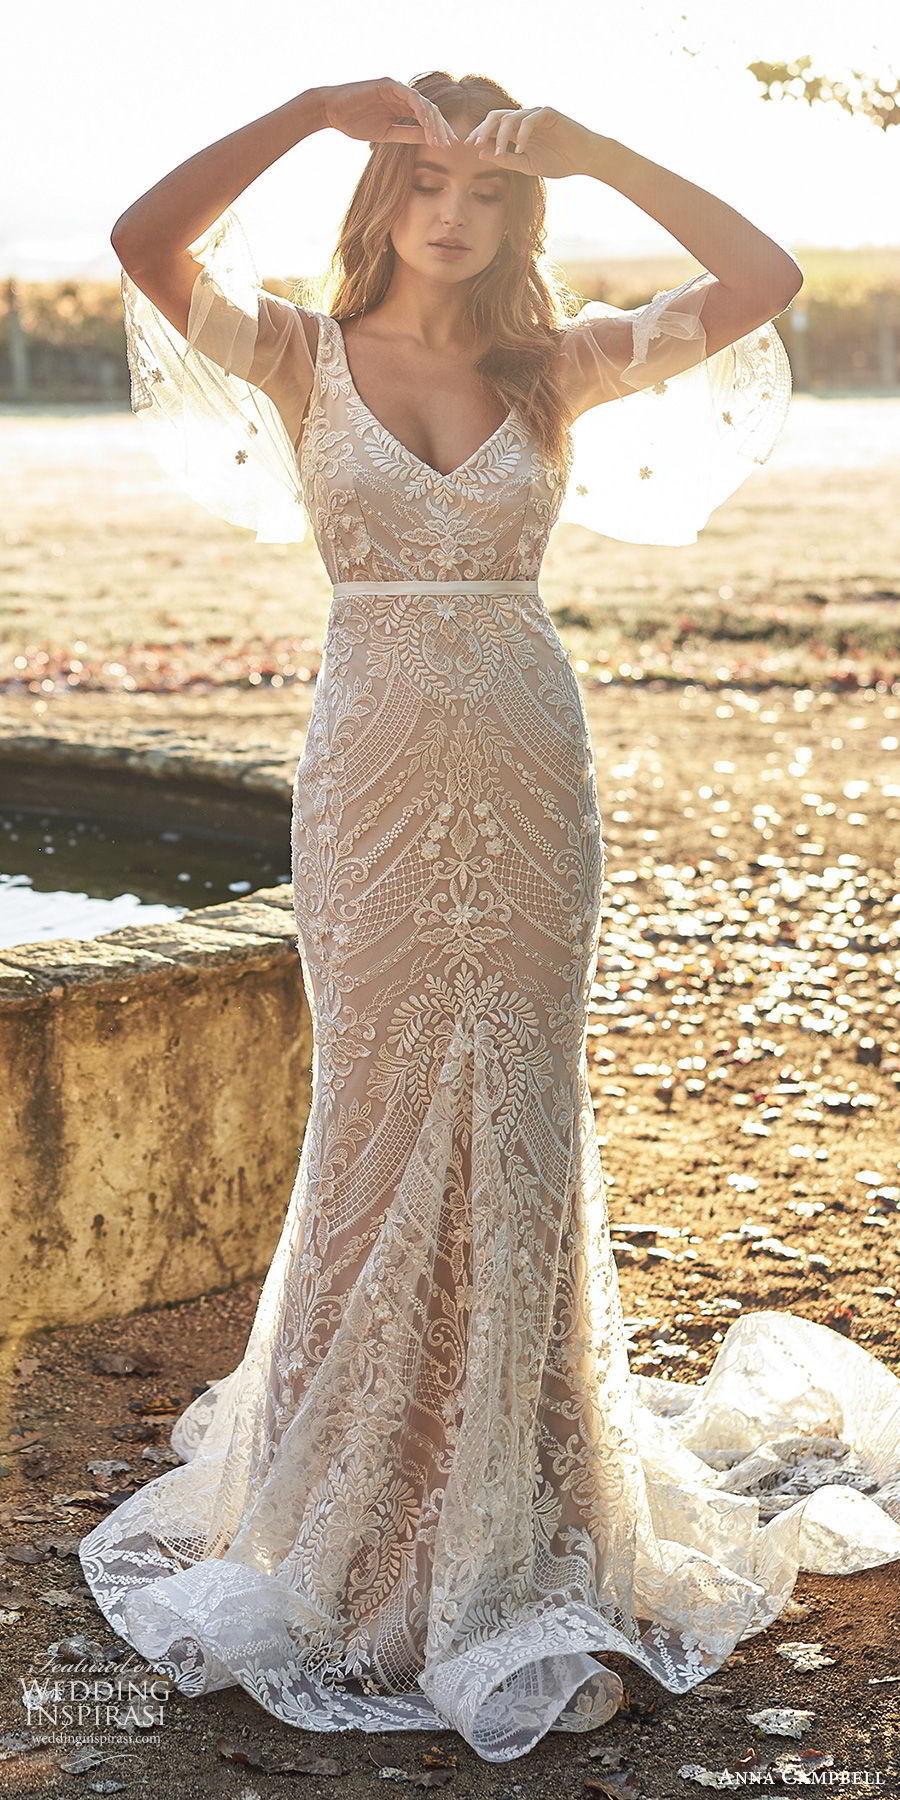 anna campbell 2020 bridal illusion flutter sleees sleeveless thick straps deep v neckline fully embellished embroidered lace sheath wedding dress (9) elegant v back chapel train mv